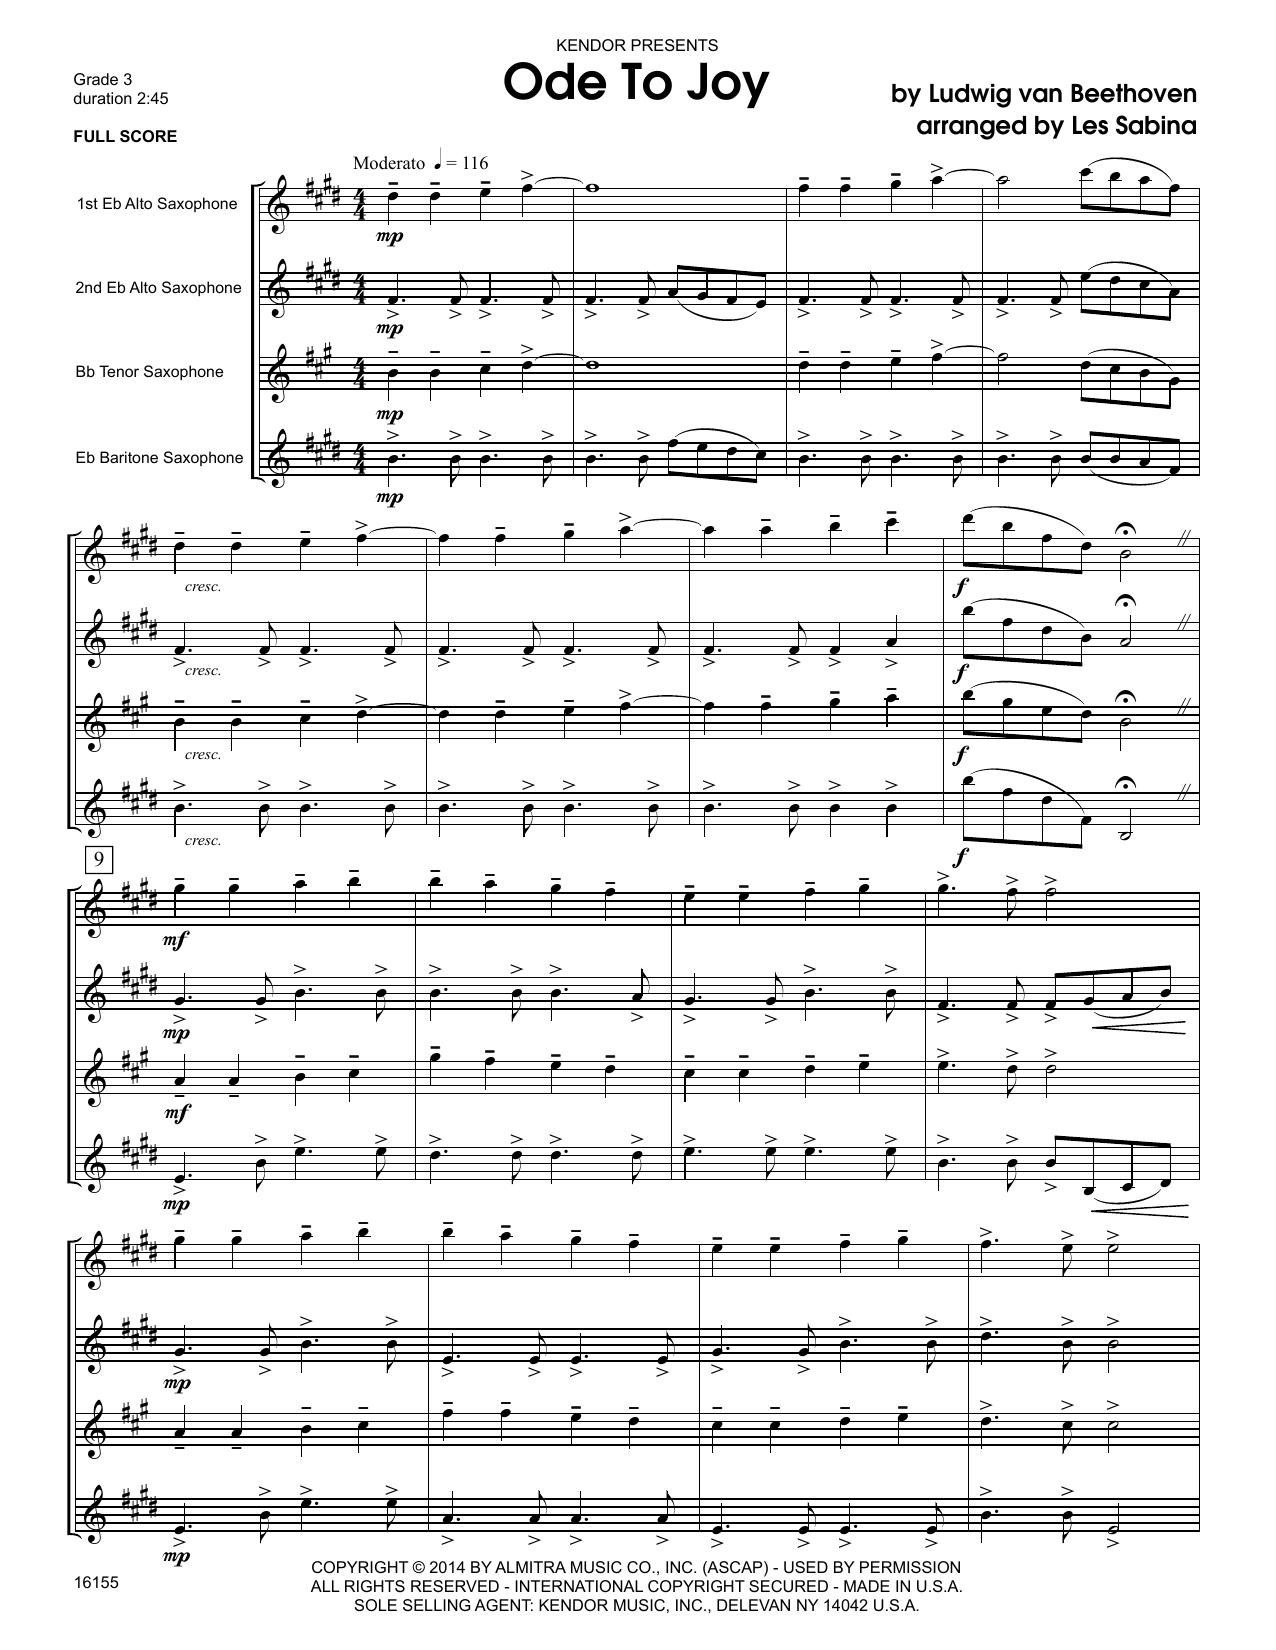 Ode To Joy (COMPLETE) sheet music for saxophone quartet by Les Sabina